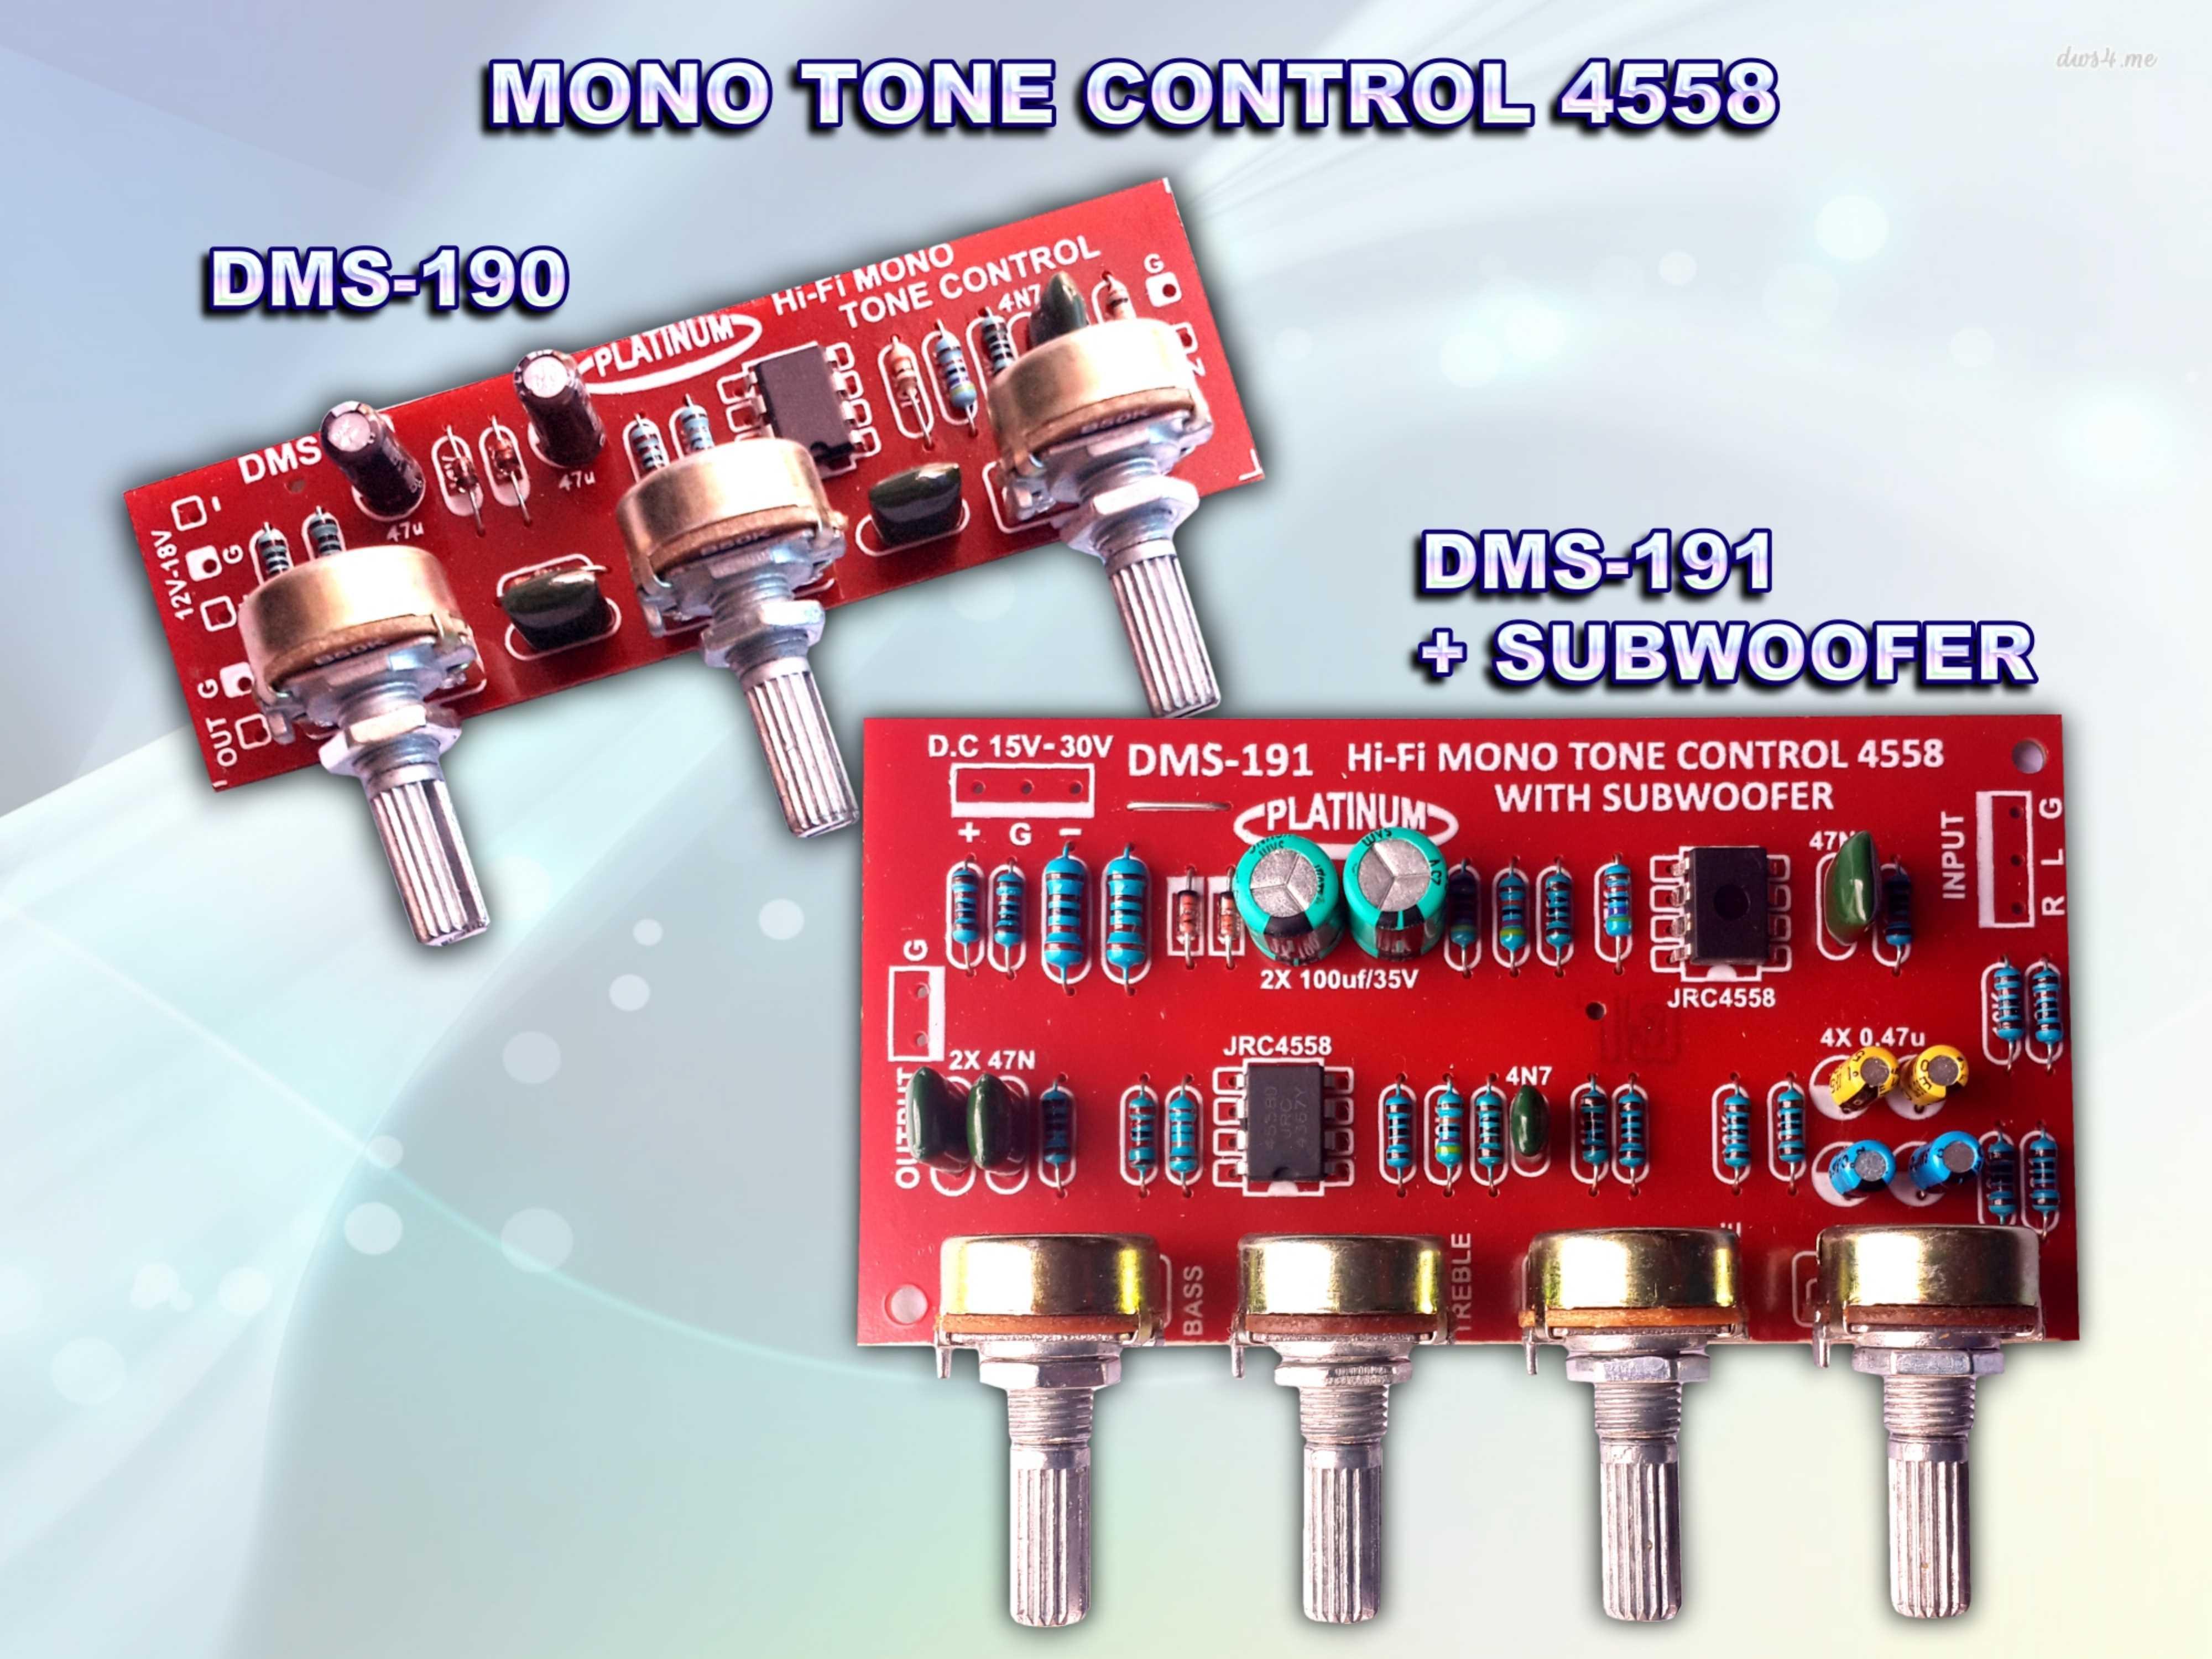 Aksesoris Mixer Tone Control Dll Lets Do It Circuit Passive Kit Hi Fi Mono Dms 190 191